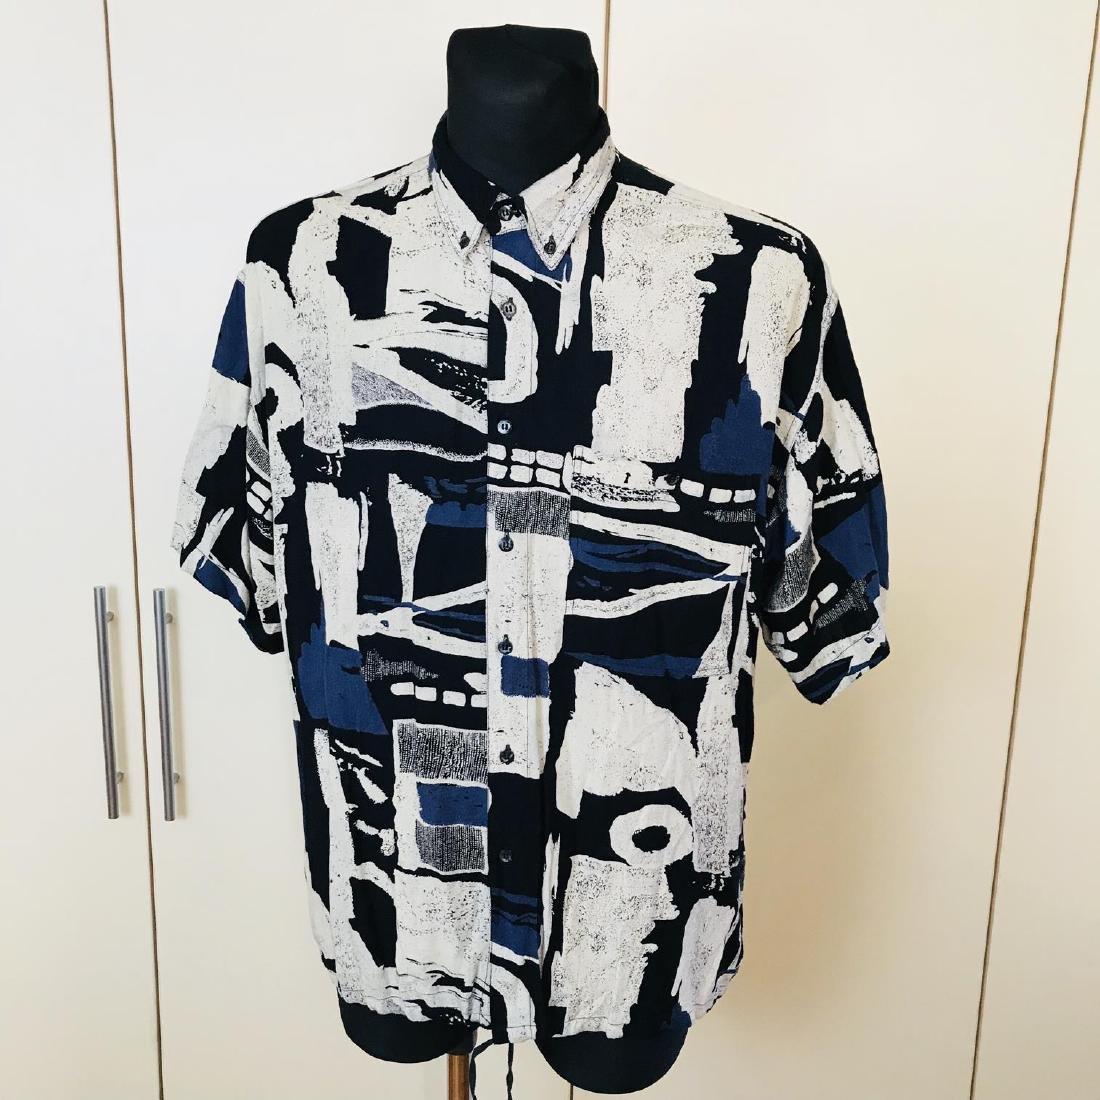 Vintage Men's DAYTON Hawaiian Shirt Top Size XL - 2